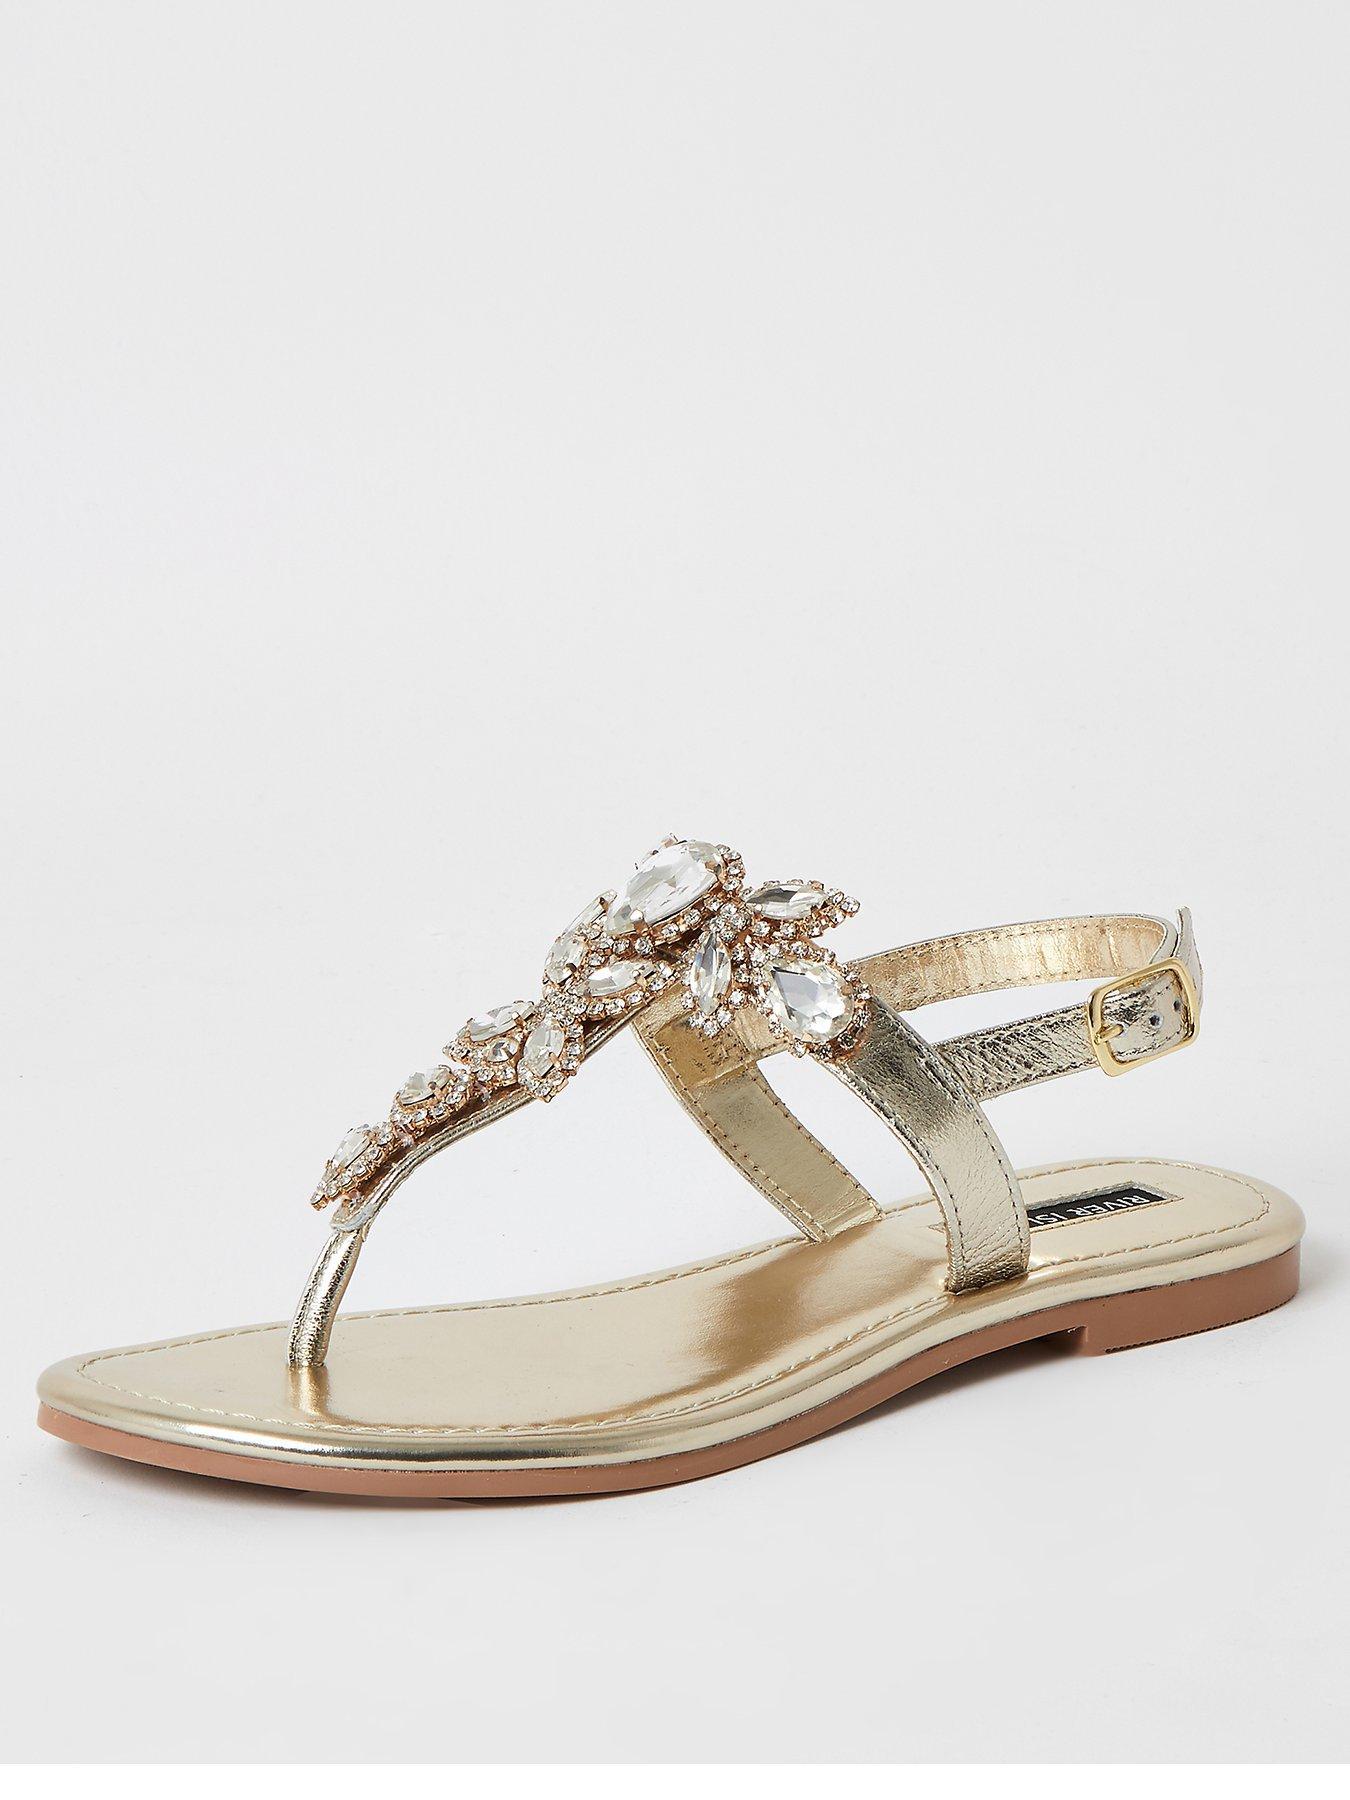 Gold | River island | Sandals \u0026 flip